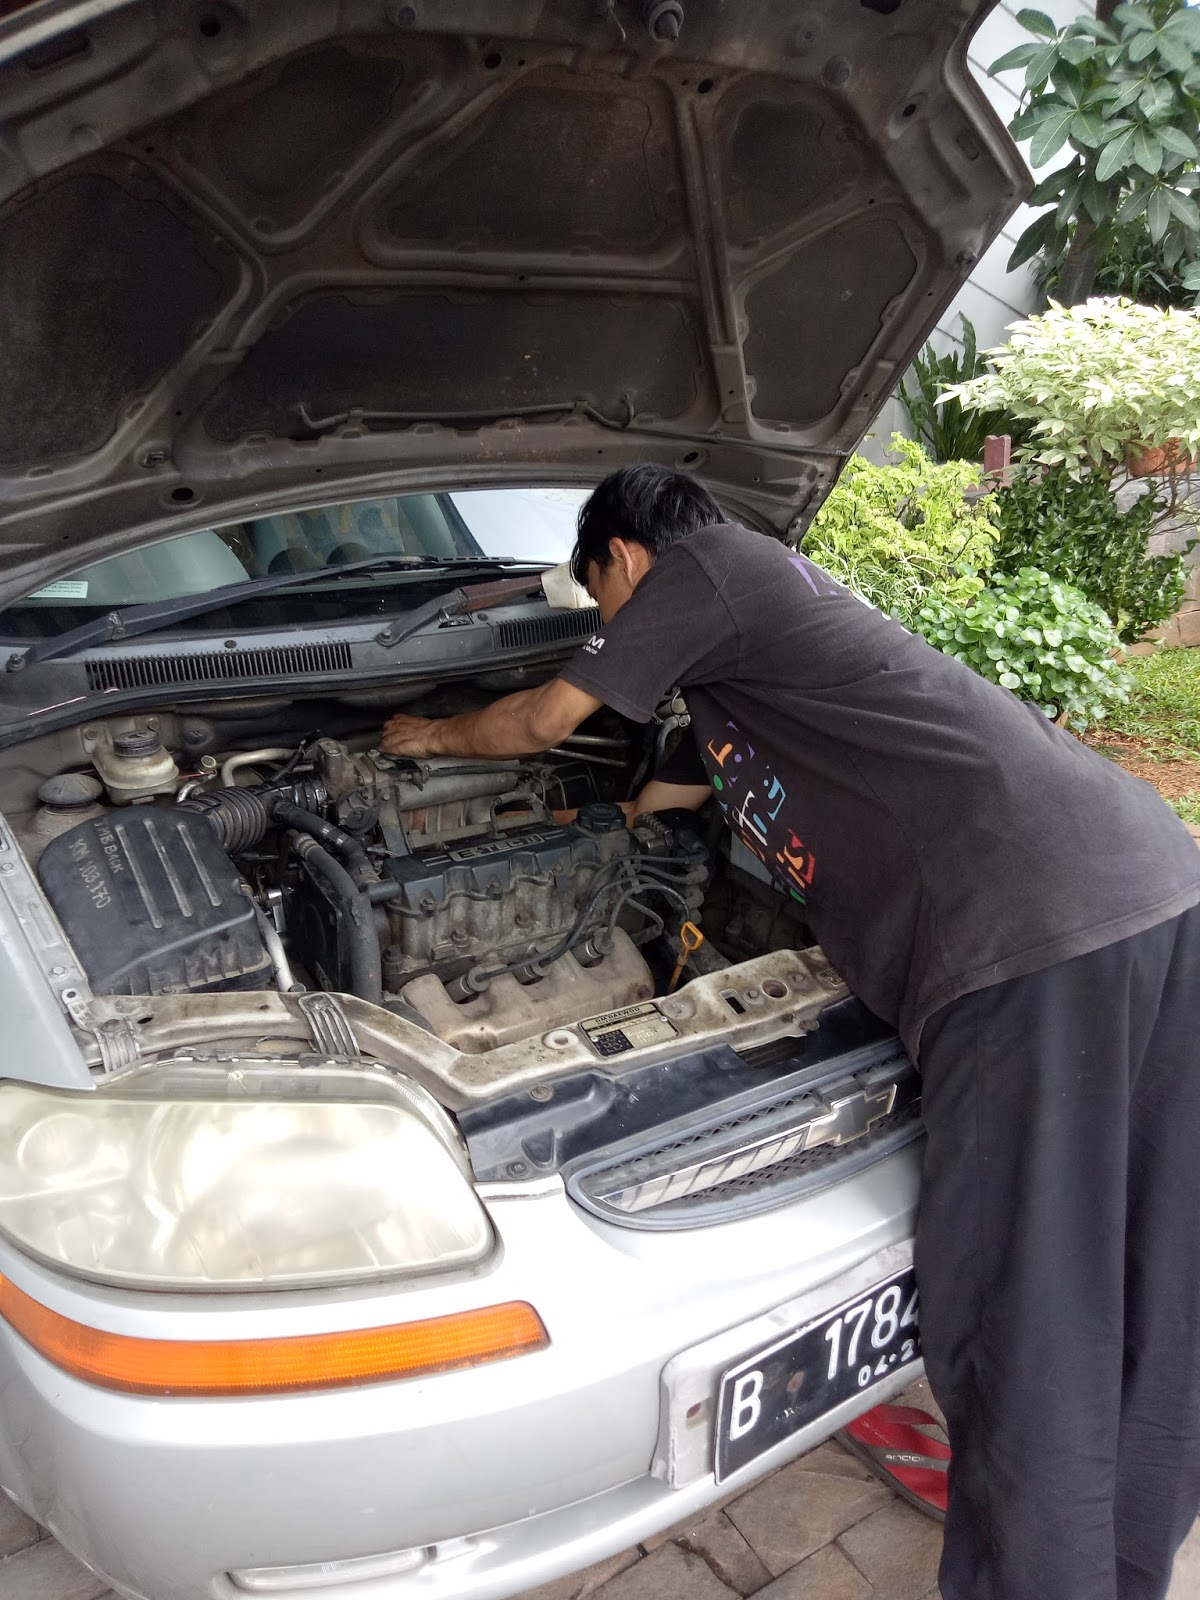 Bengkel Mobil 24 Jam Jakarta Selatan 081286922830